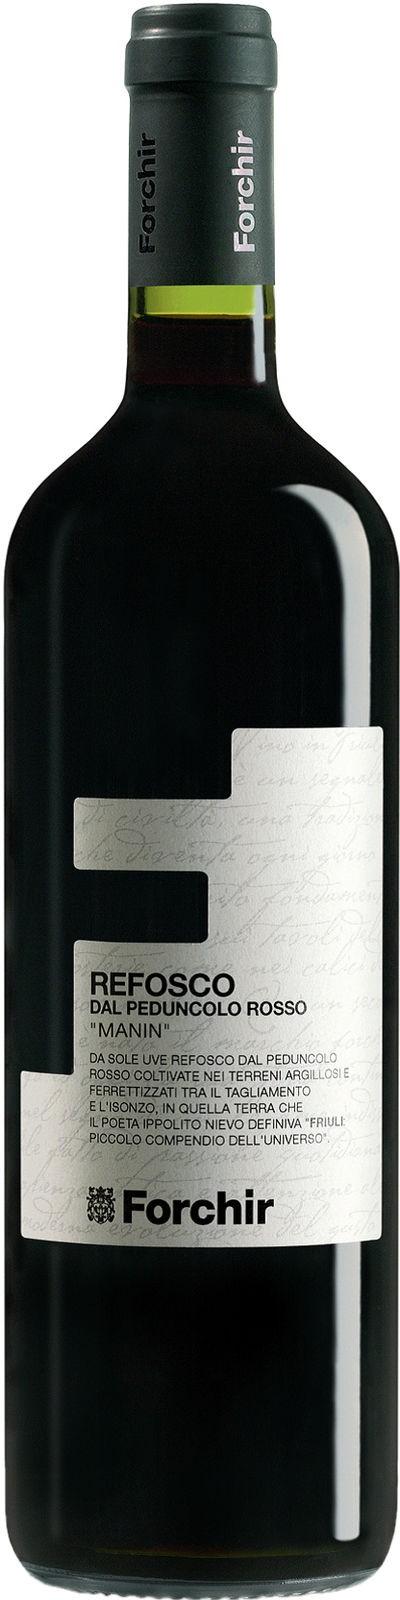 Refosco dal Peduncolo Rosso DOC Manin Forchir Friaul-Julisch Venetien